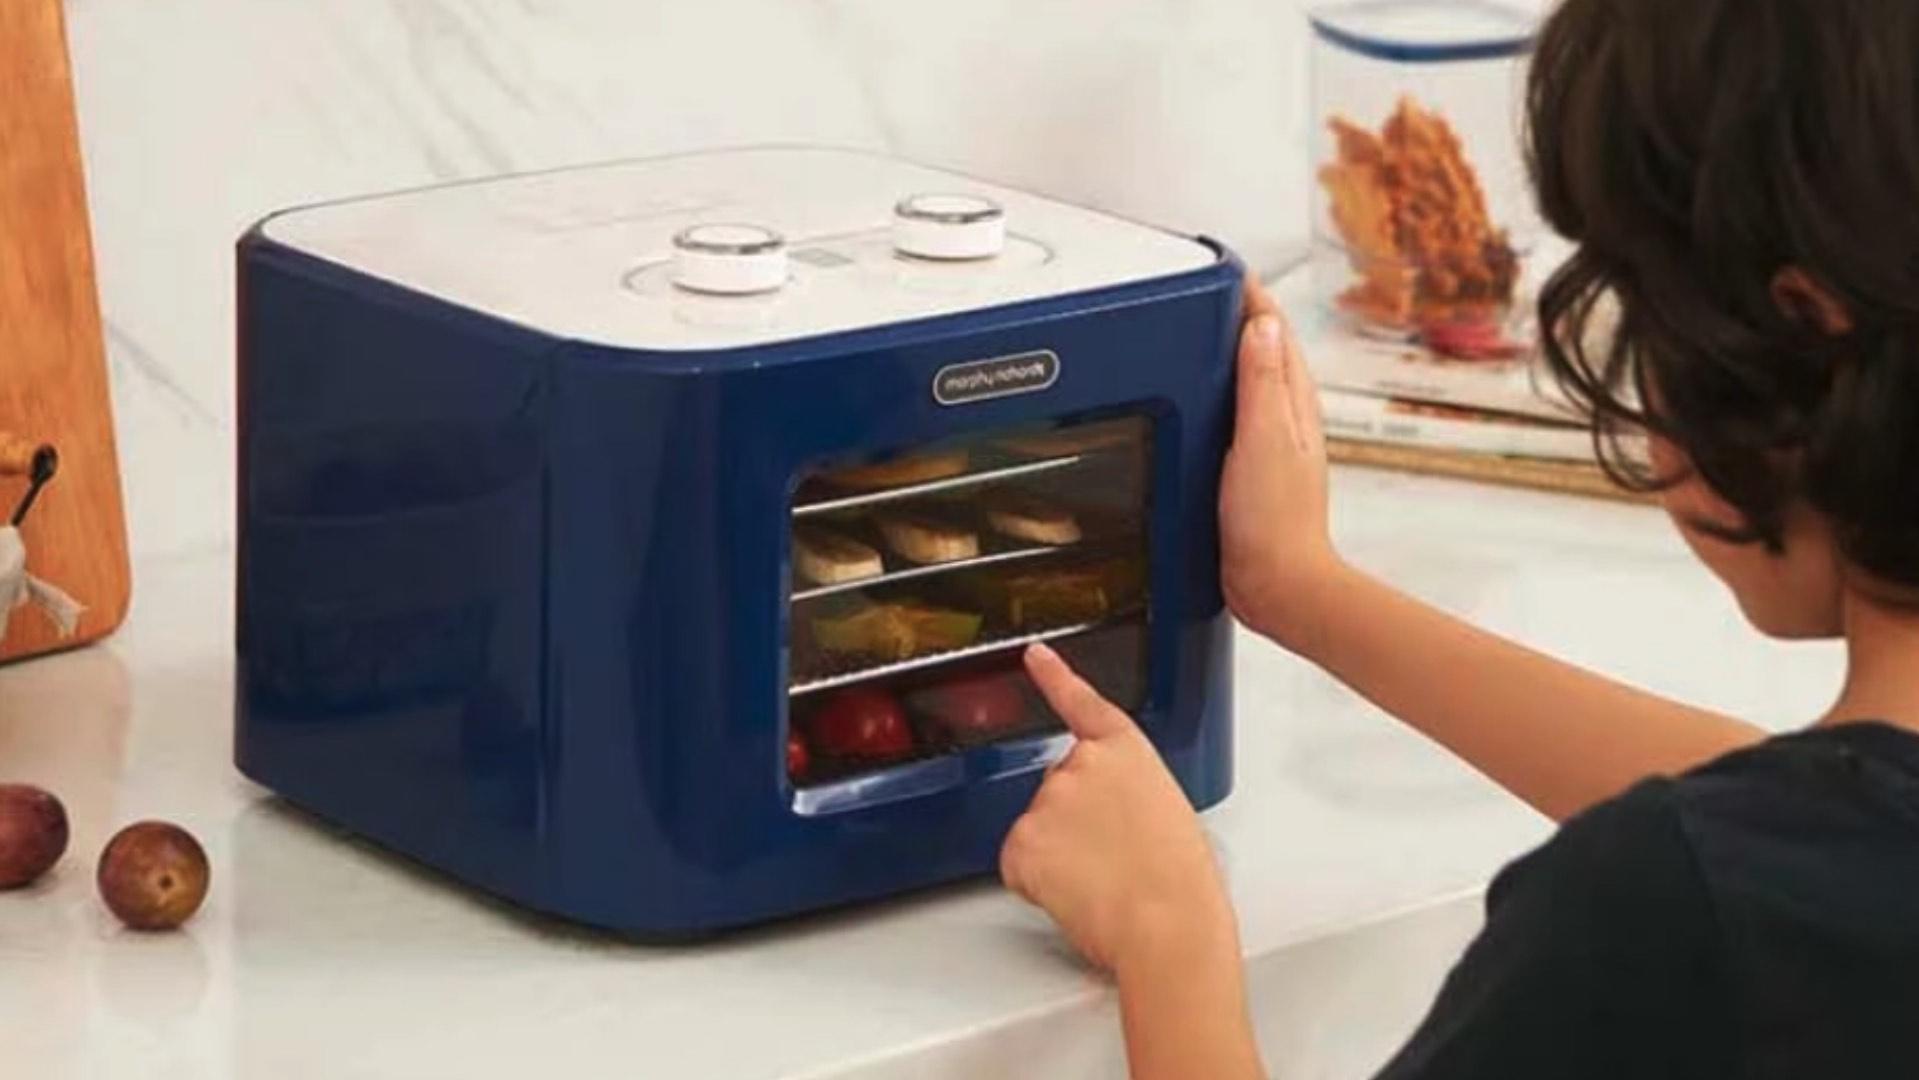 Mofei Food Dehydrator essiccatore smart – Banggood